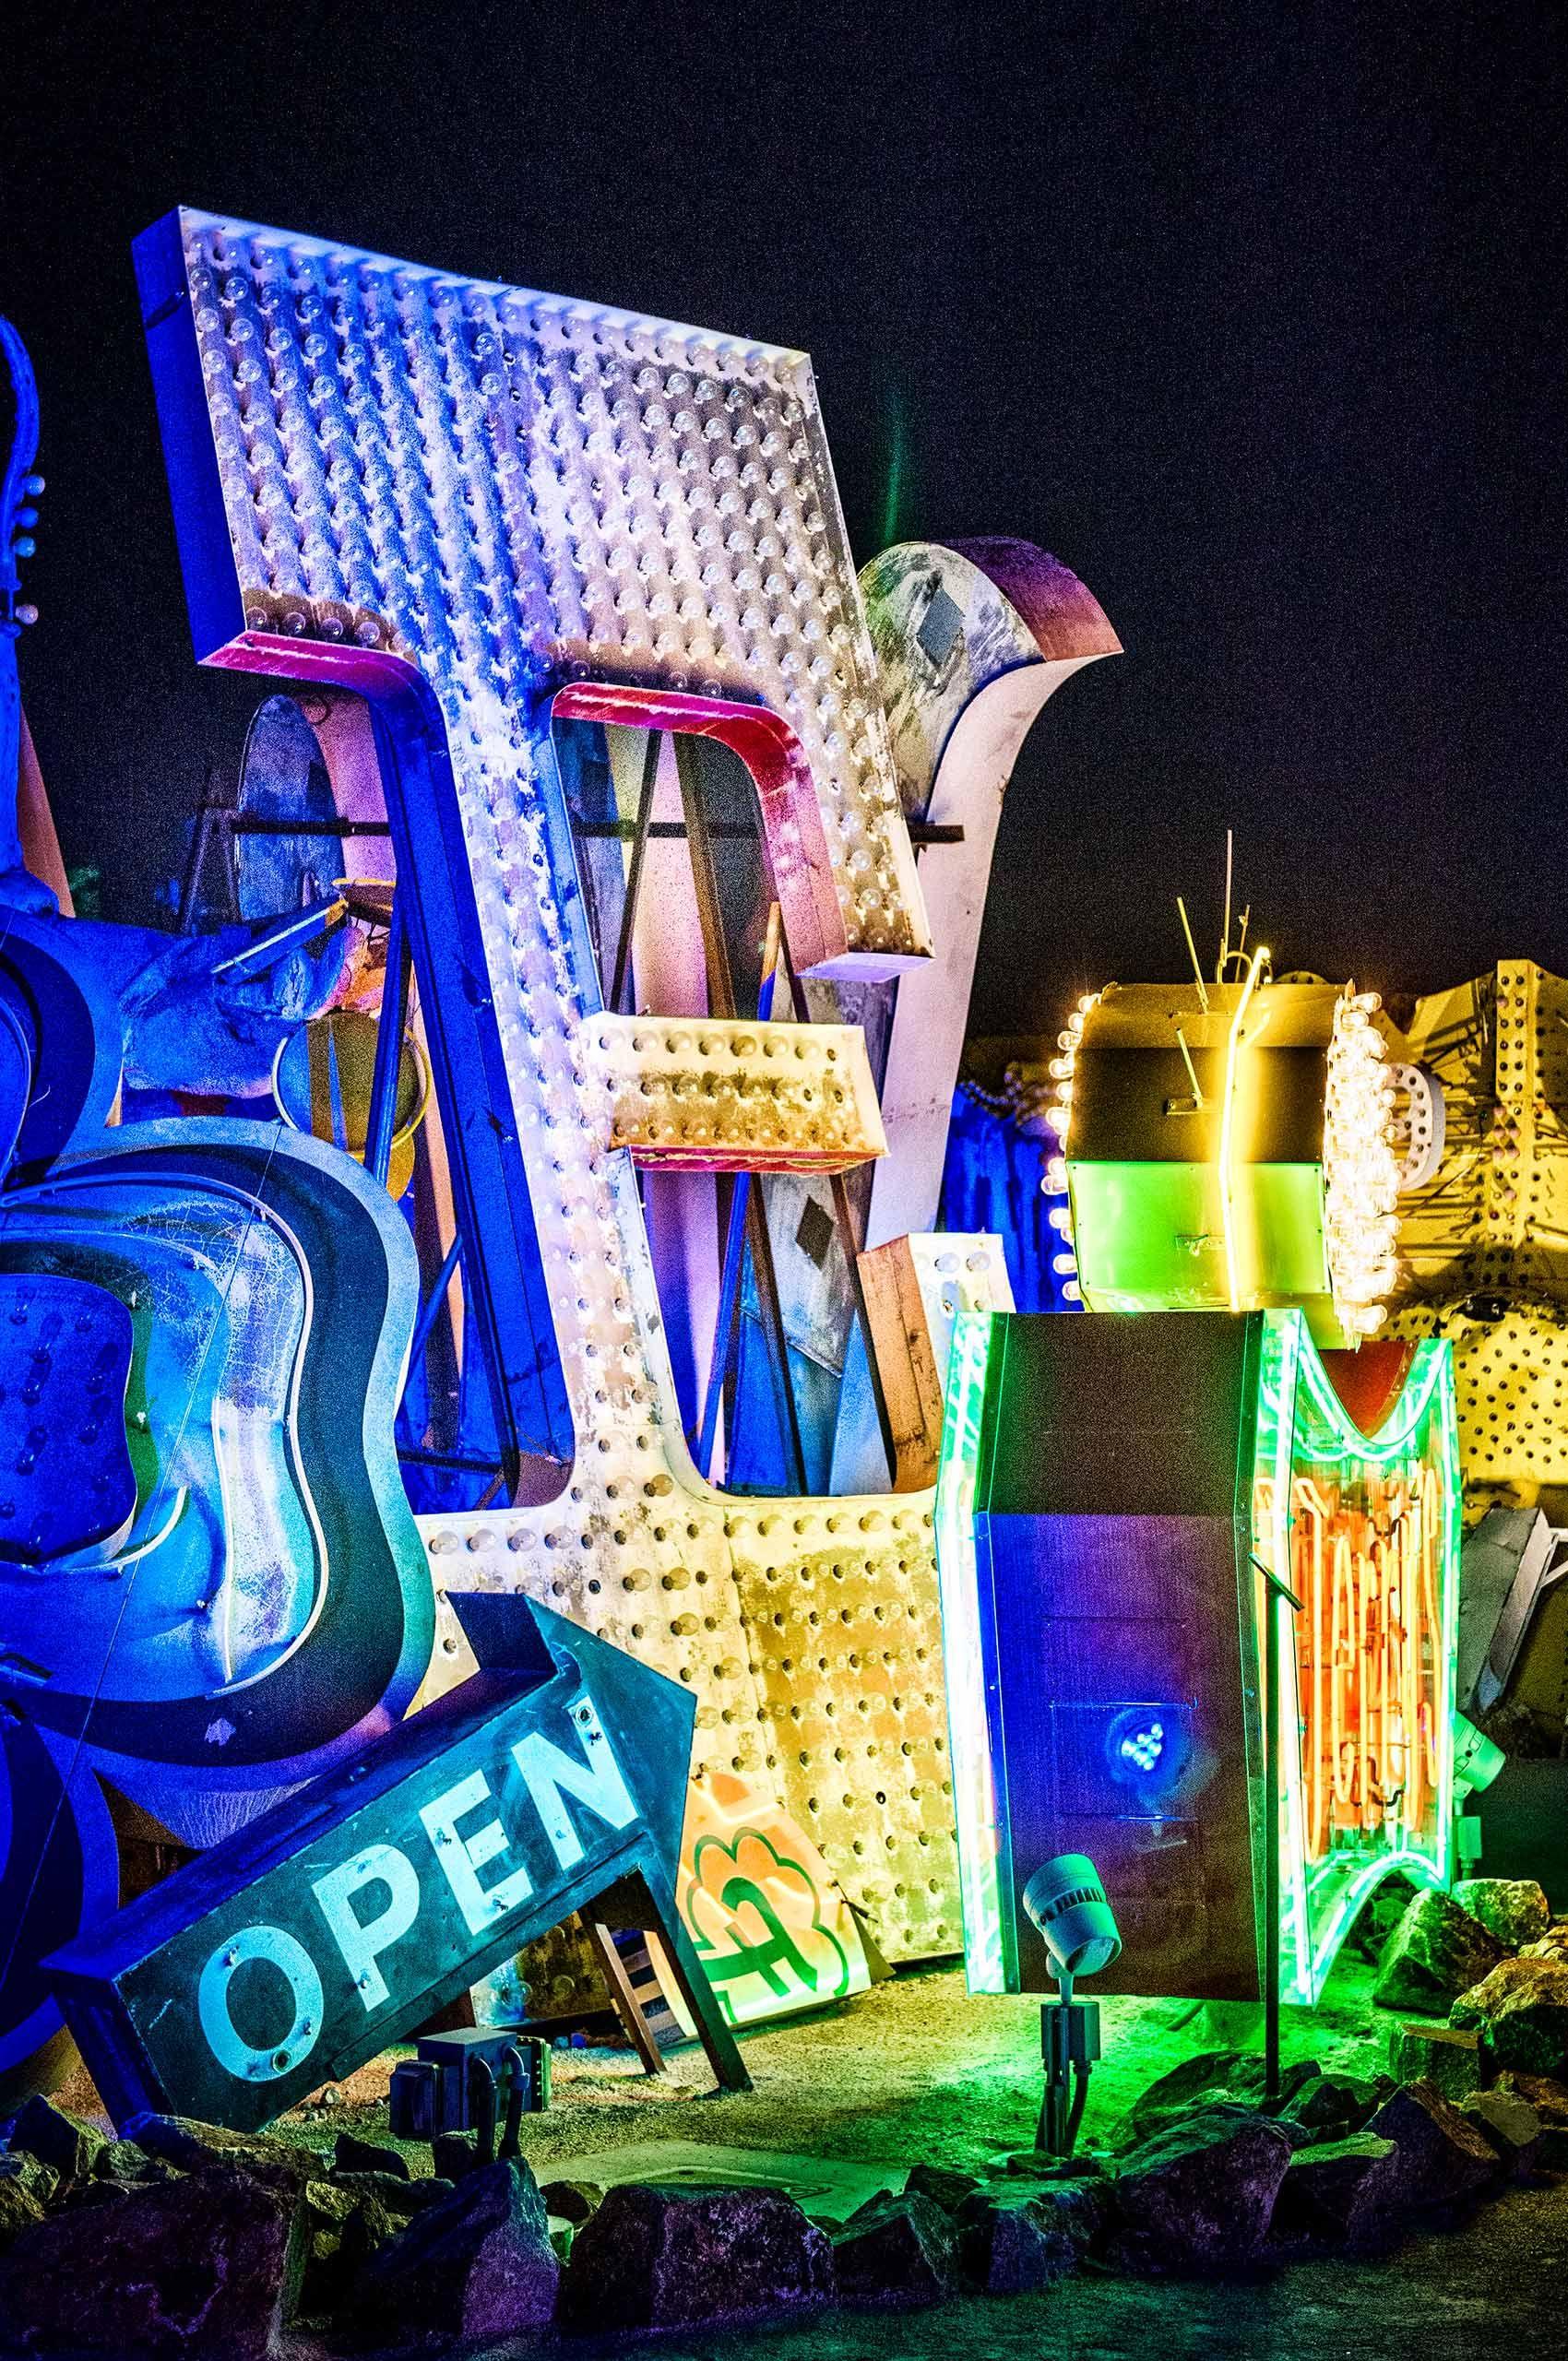 e-sign-neonmuseum-Henrik-Olund-Photography.jpg